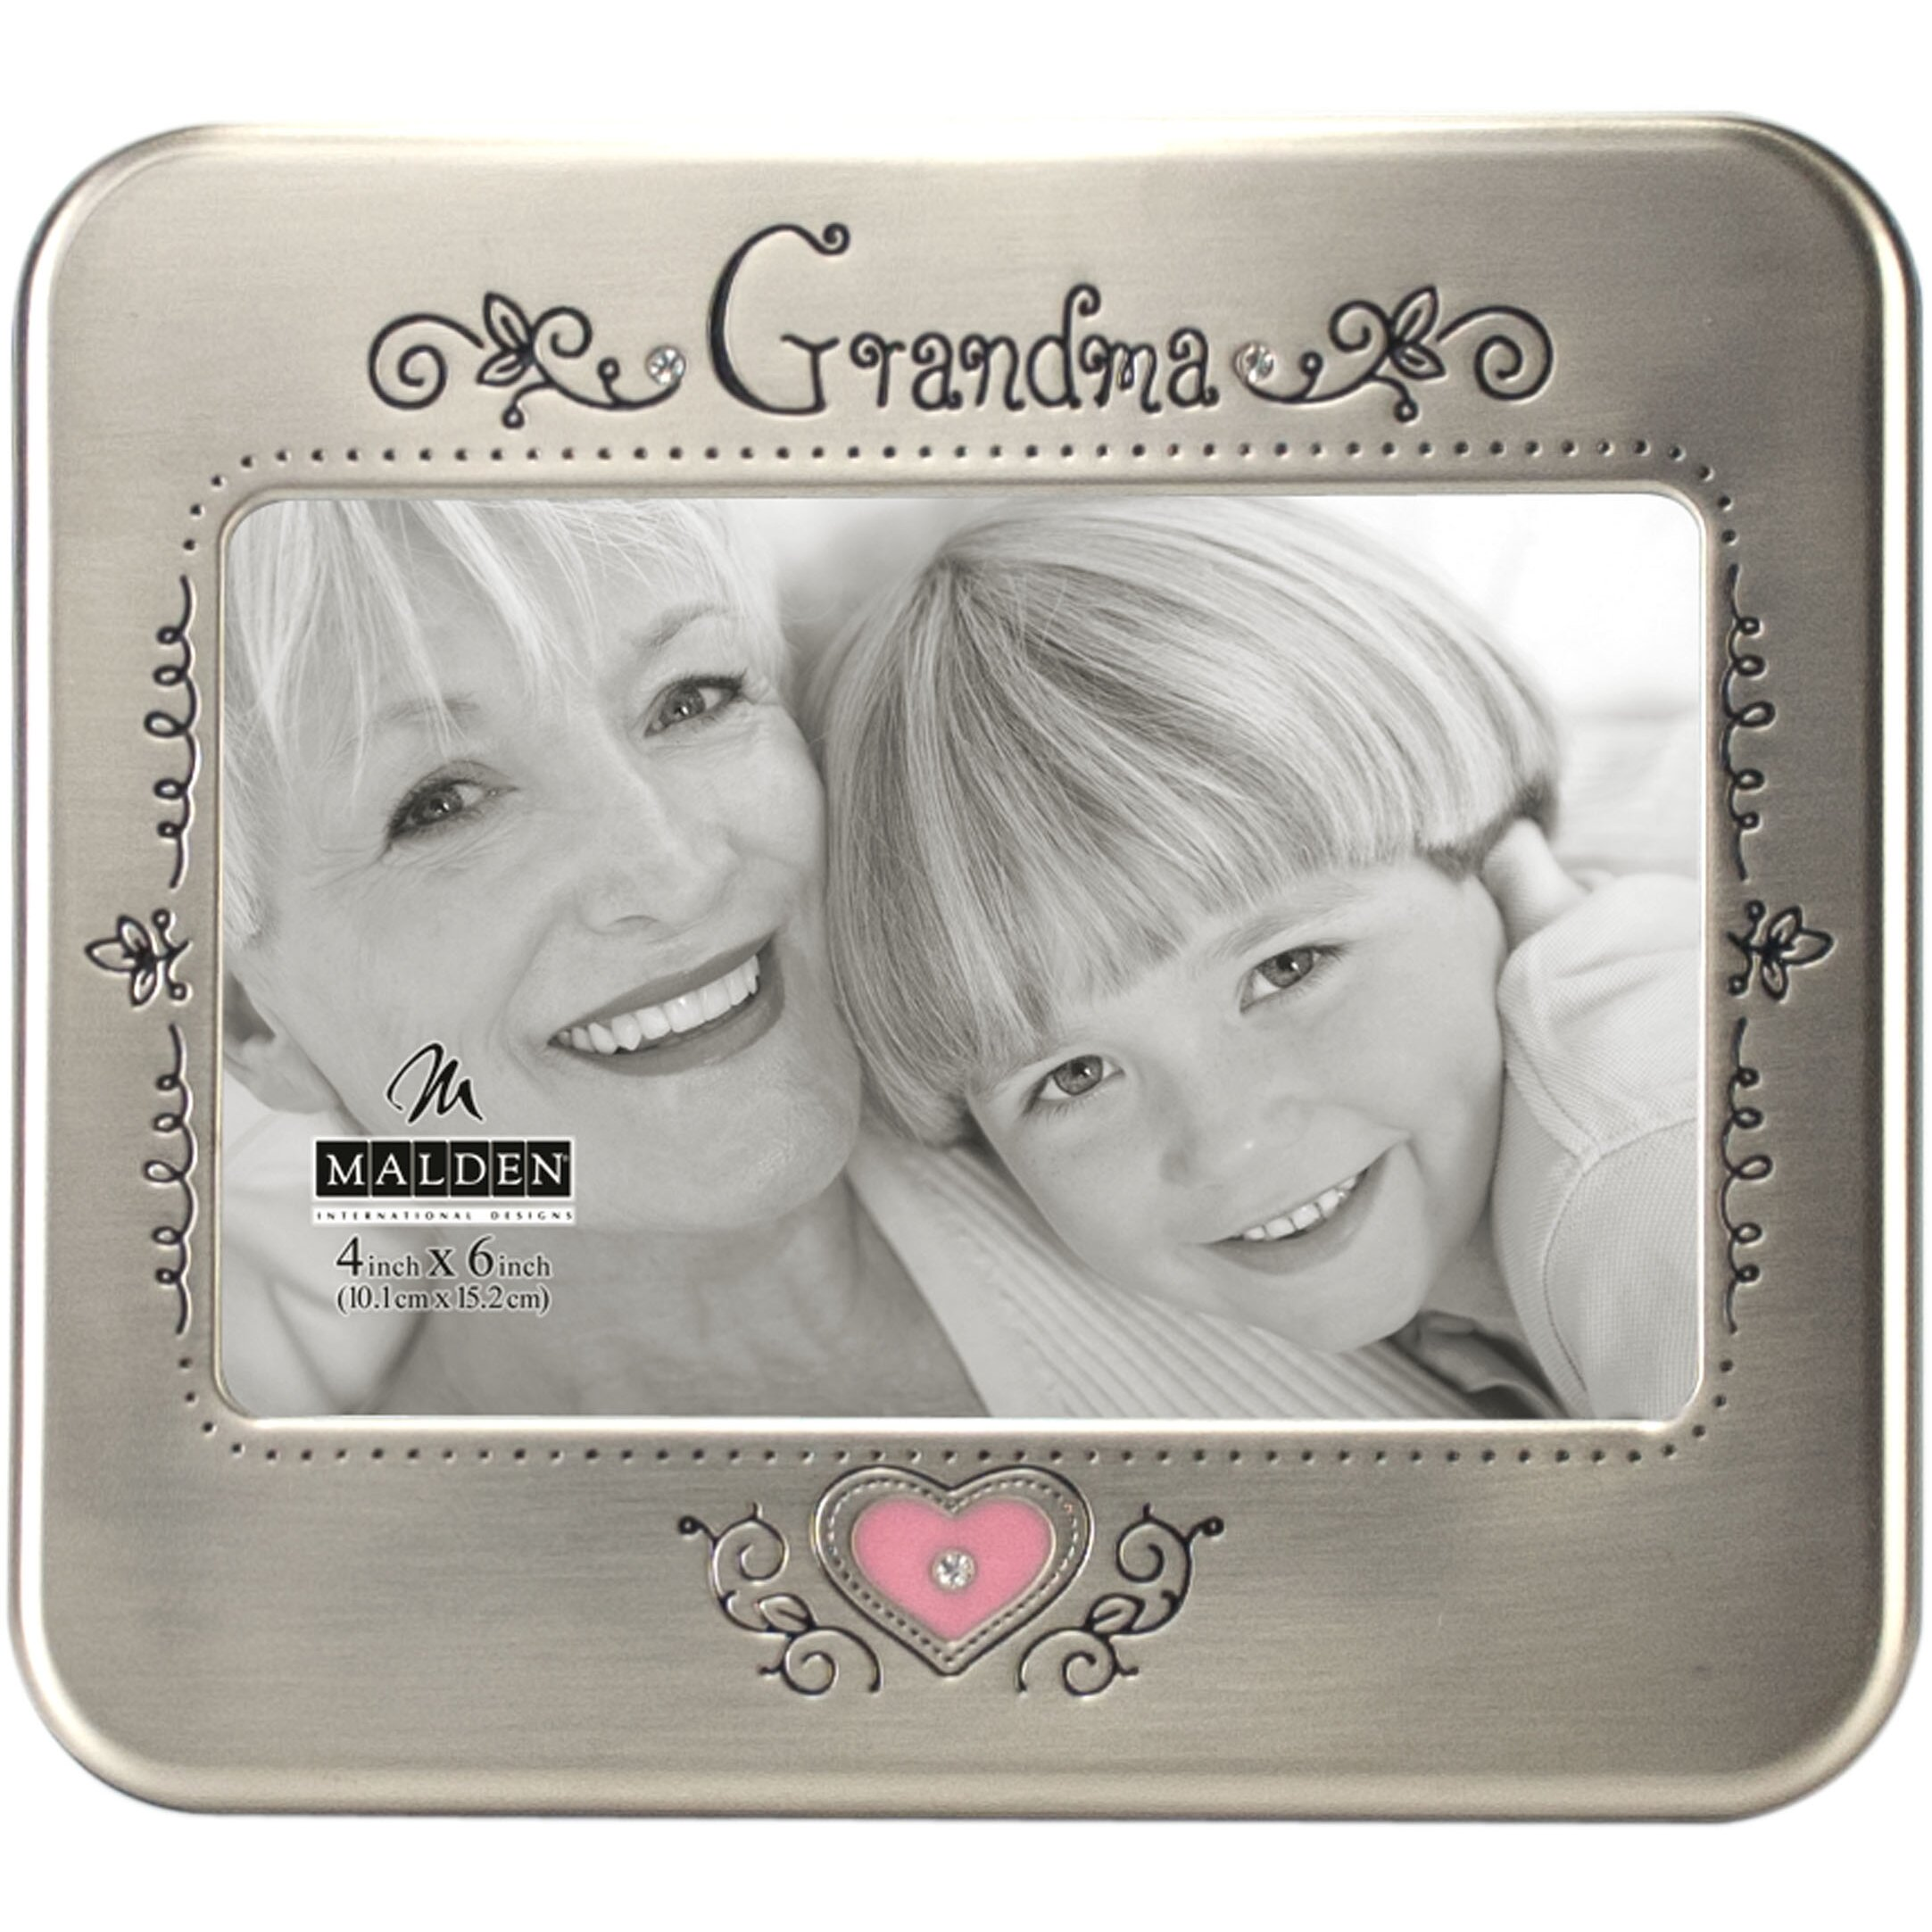 Malden Grandma Serendipity Picture Frame Amp Reviews Wayfair